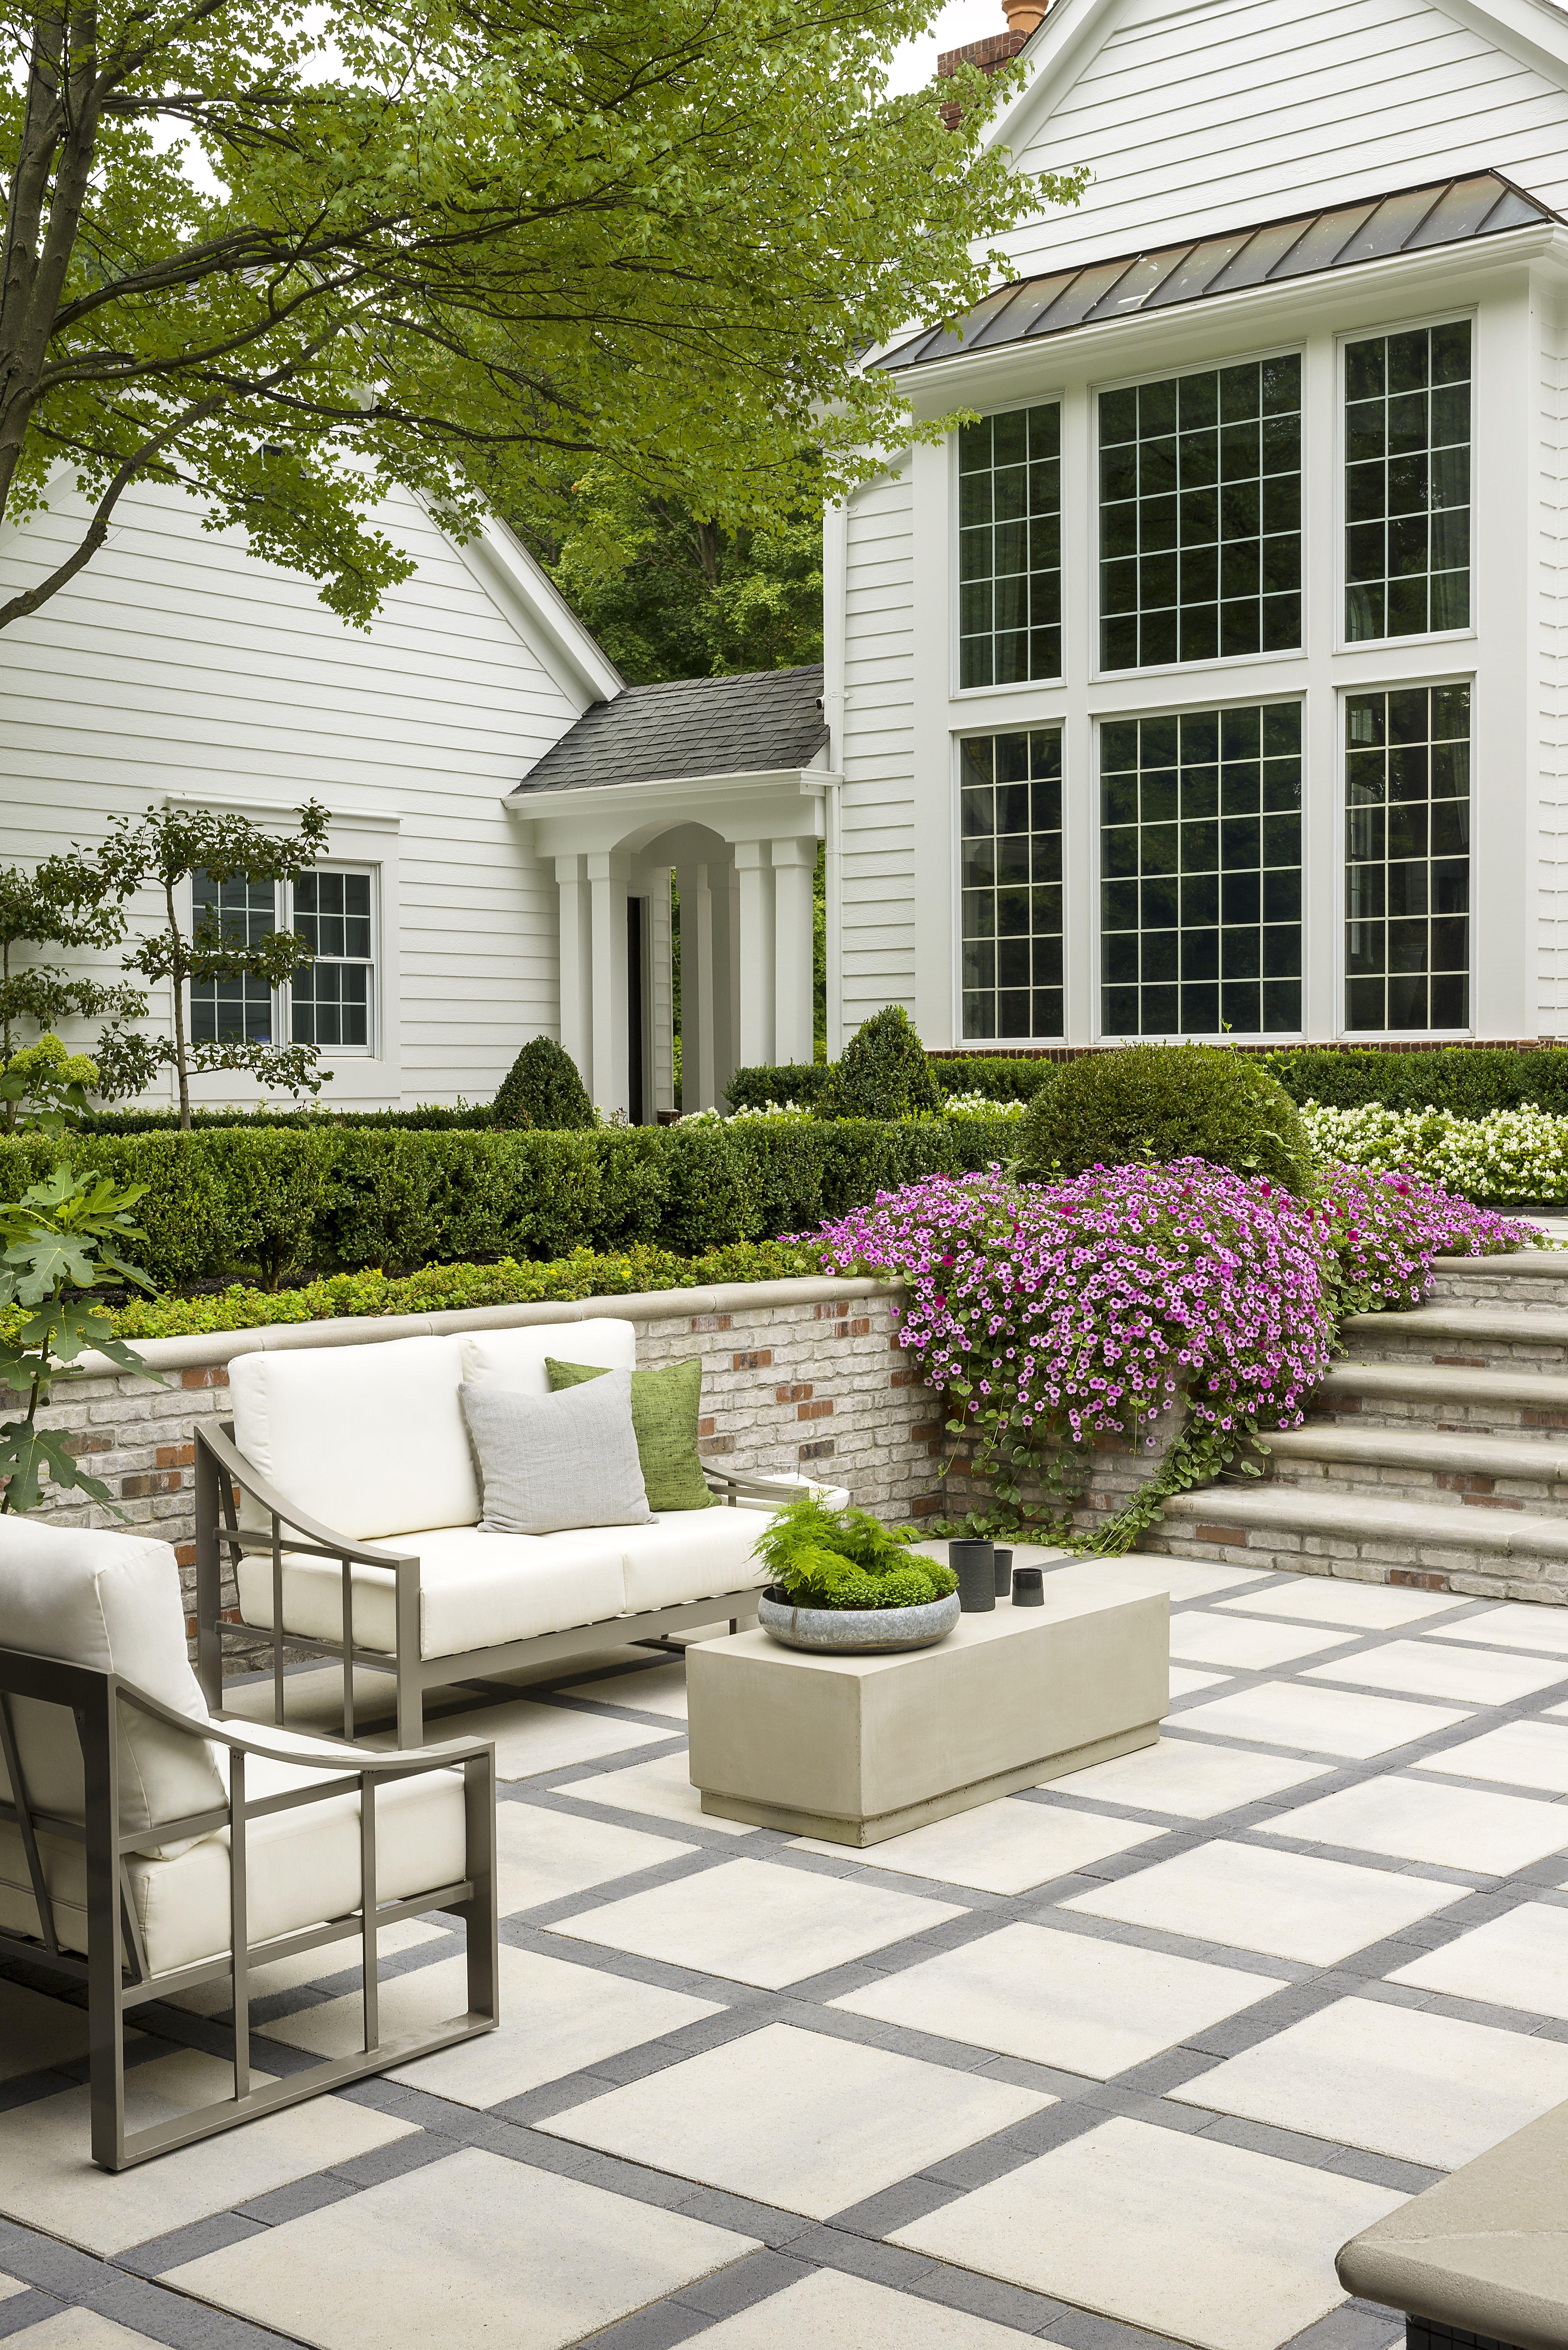 Backyard Landscaping | Patio pavers design, Concrete patio ... on Square Concrete Patio Ideas  id=69089